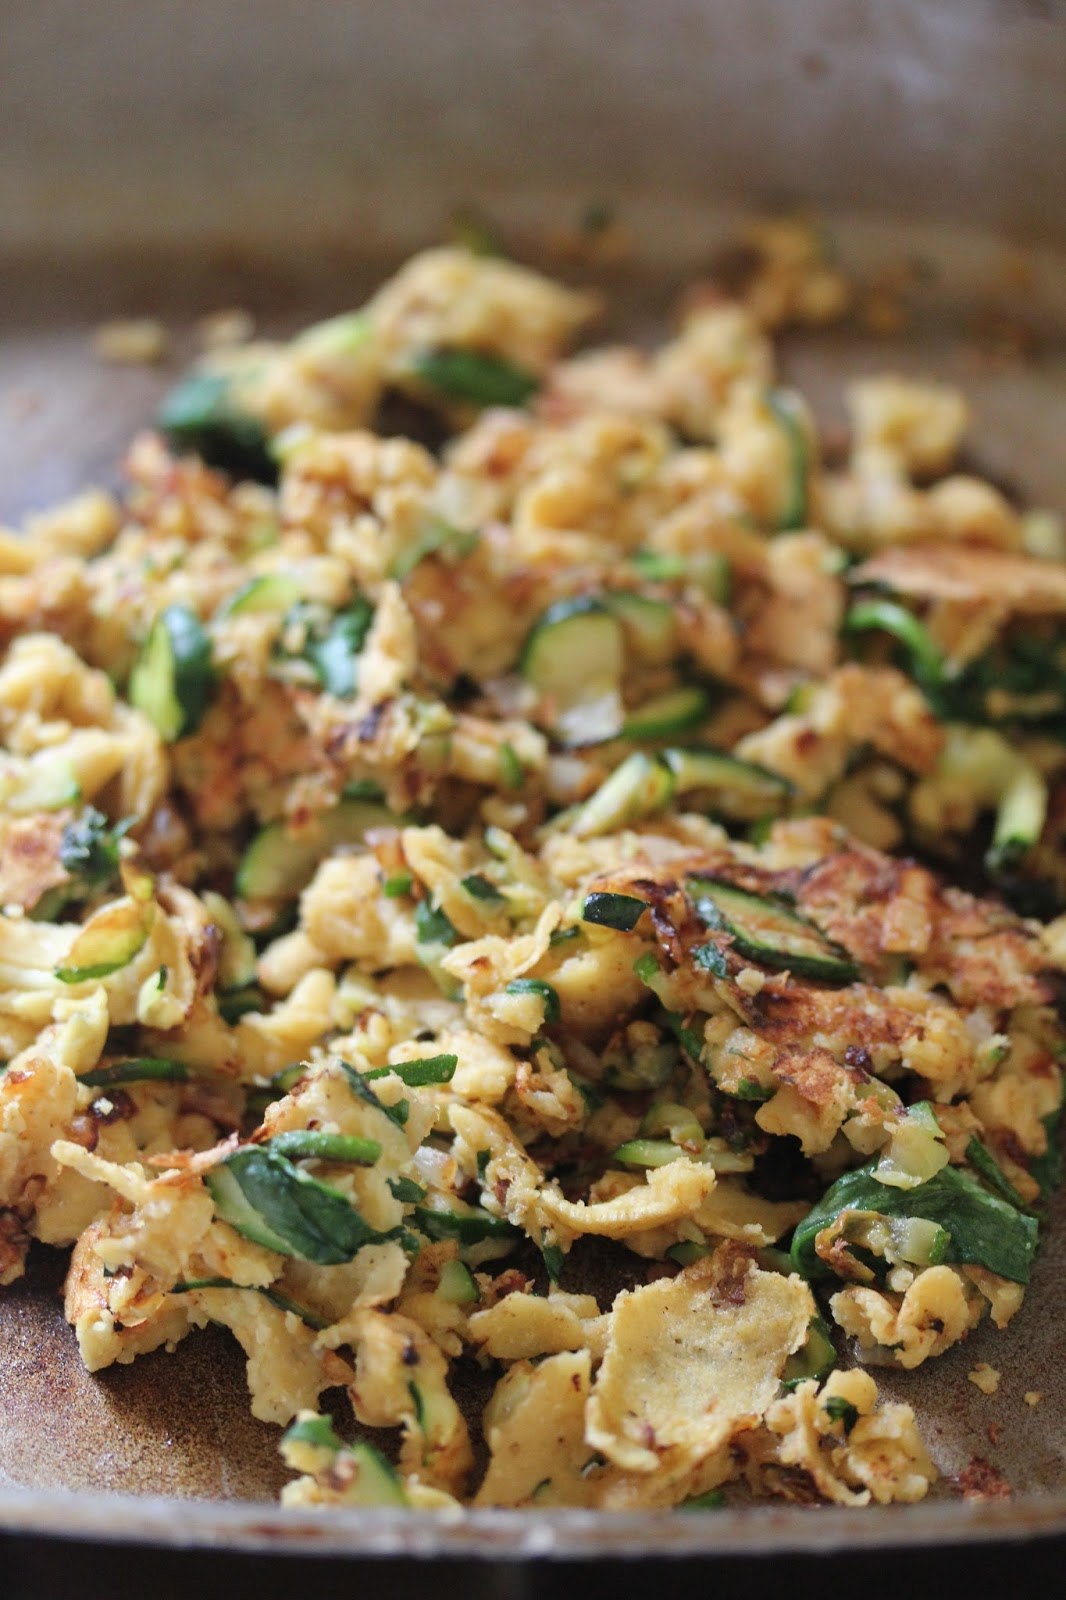 Kitchen Grrrls Vegan Food Blog With Lots Of Beautiful